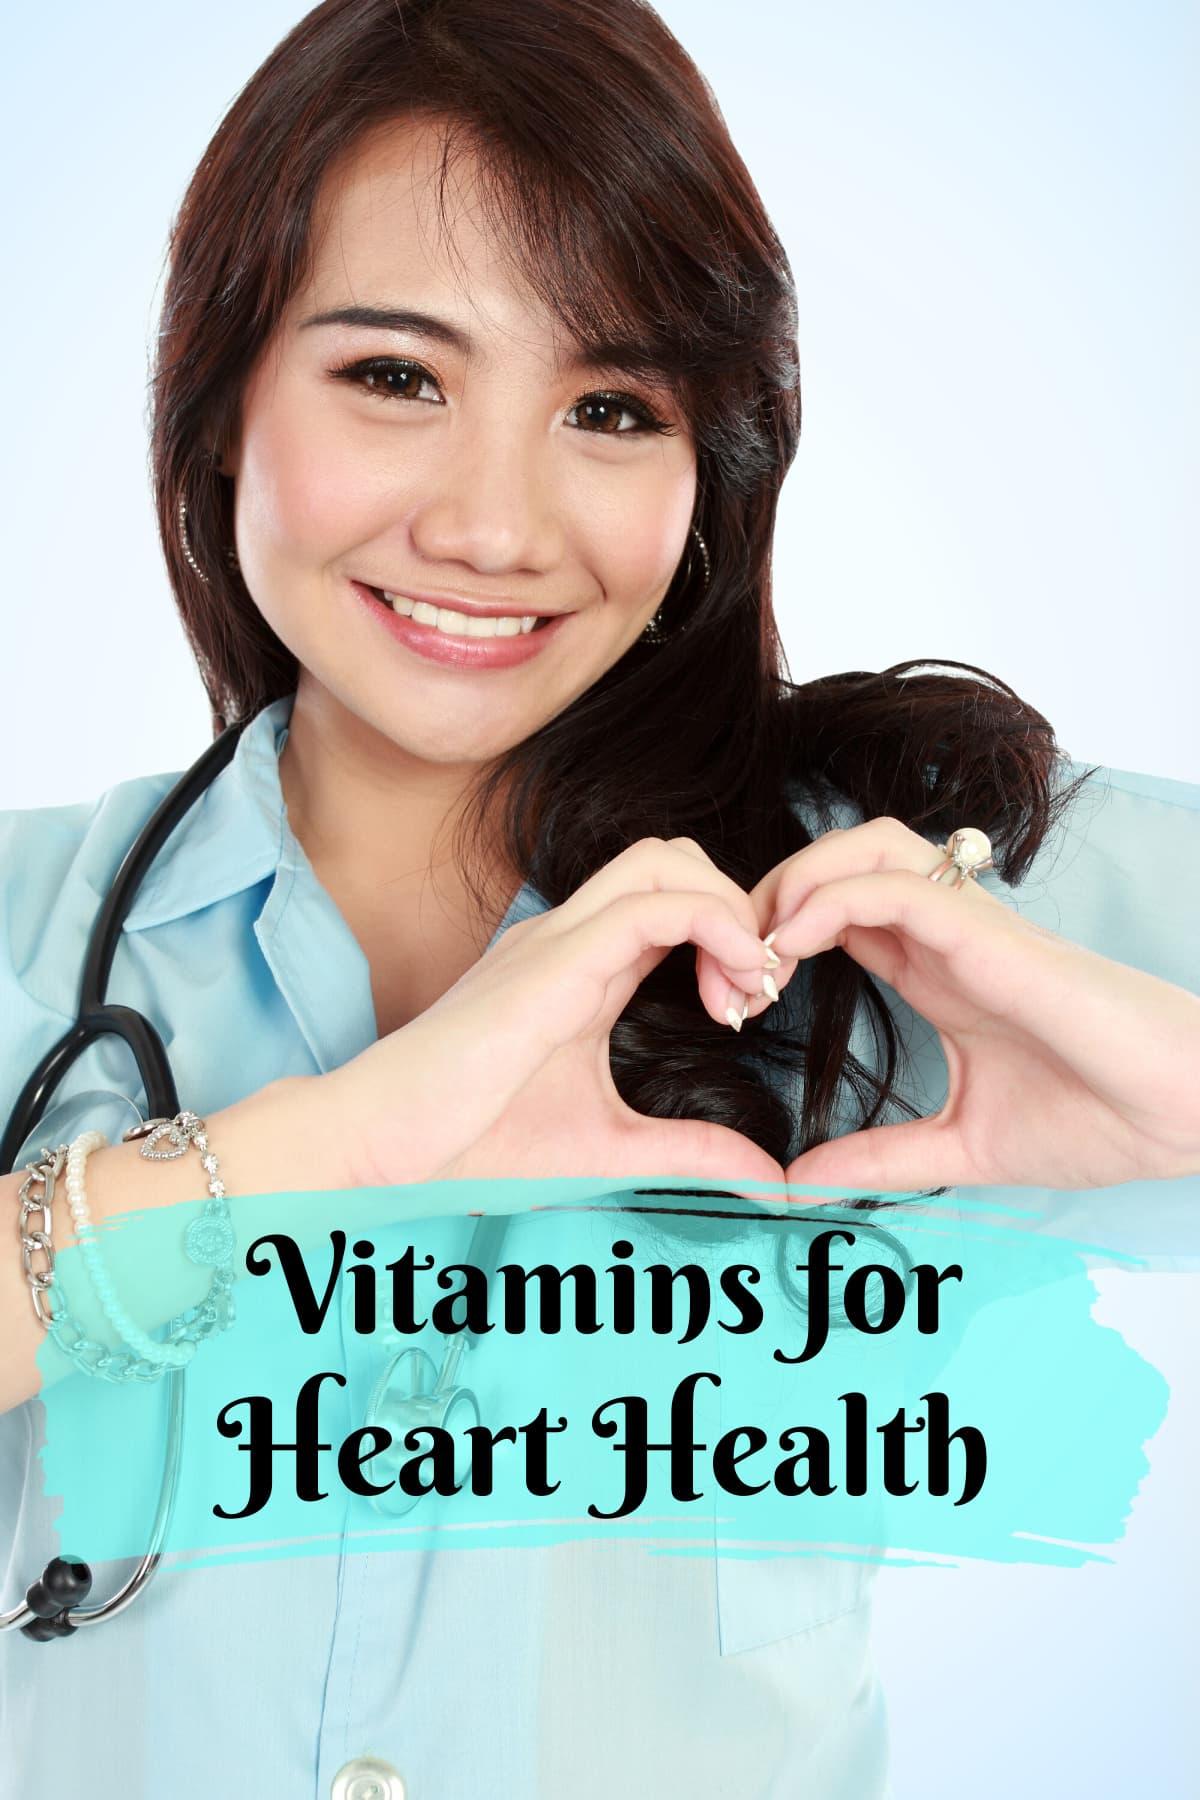 Vitamins for Heart Health